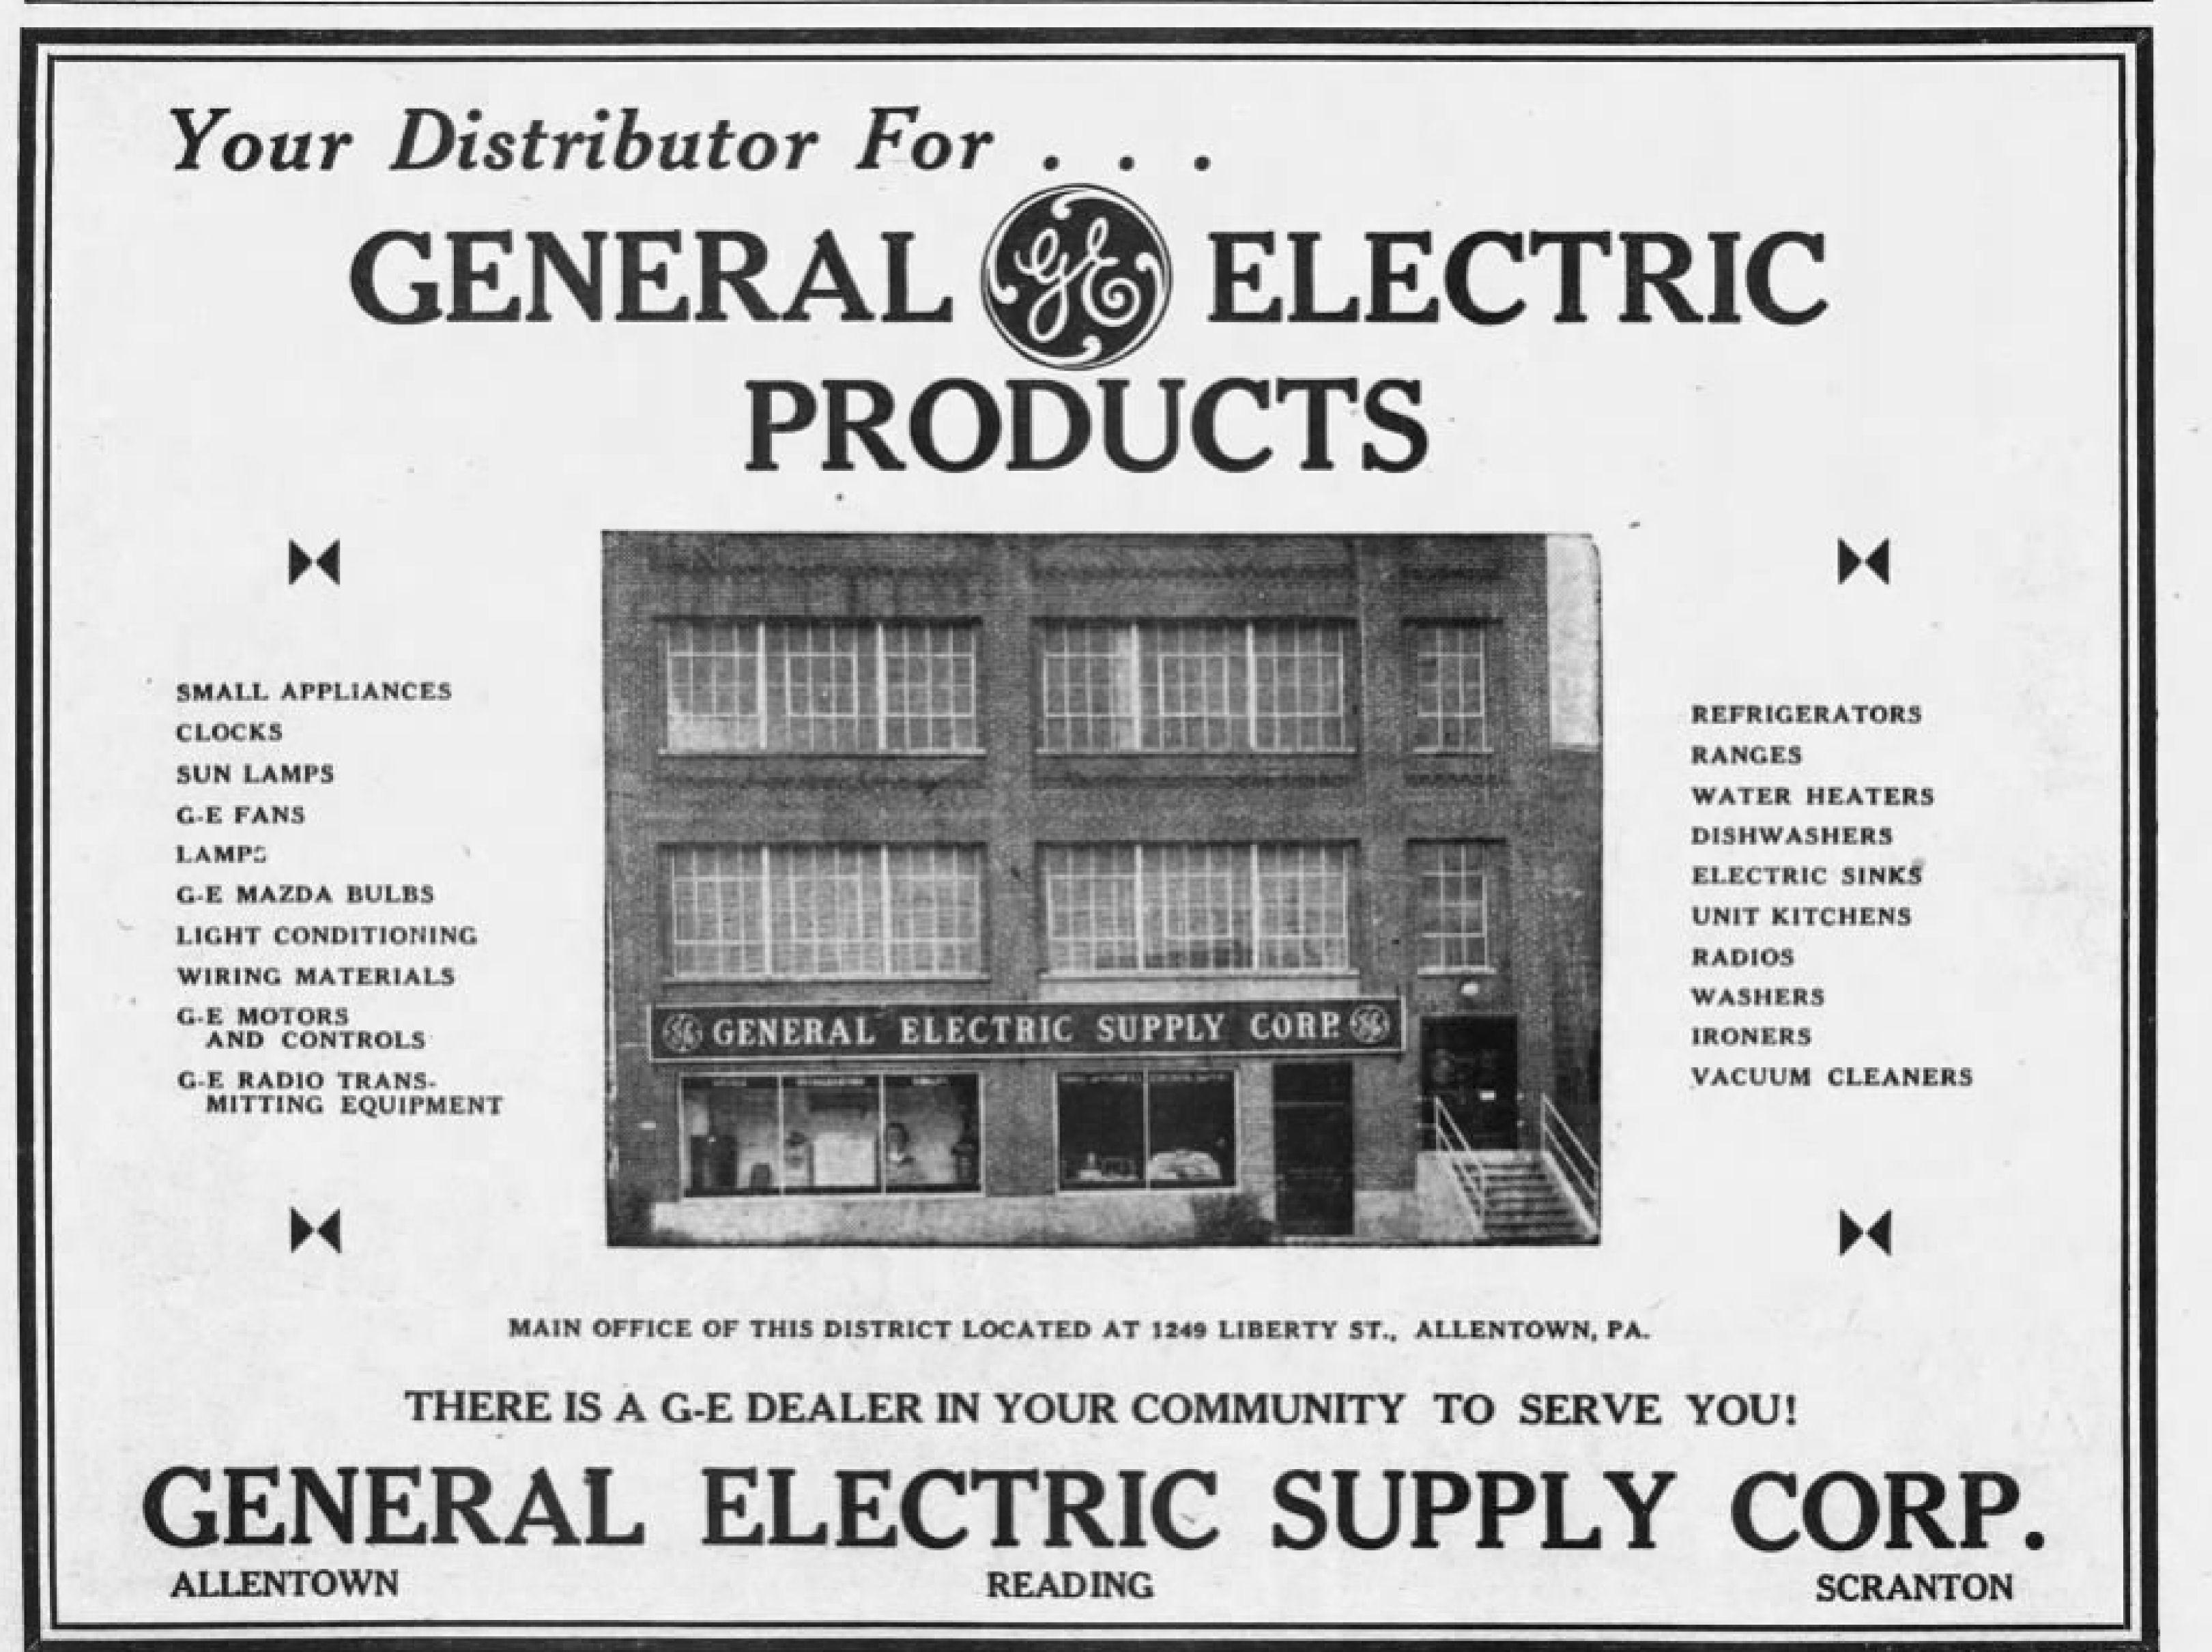 22 pa wiring file 1940 general electric supply 31 jan mc allentown pa jpg  general electric supply 31 jan mc